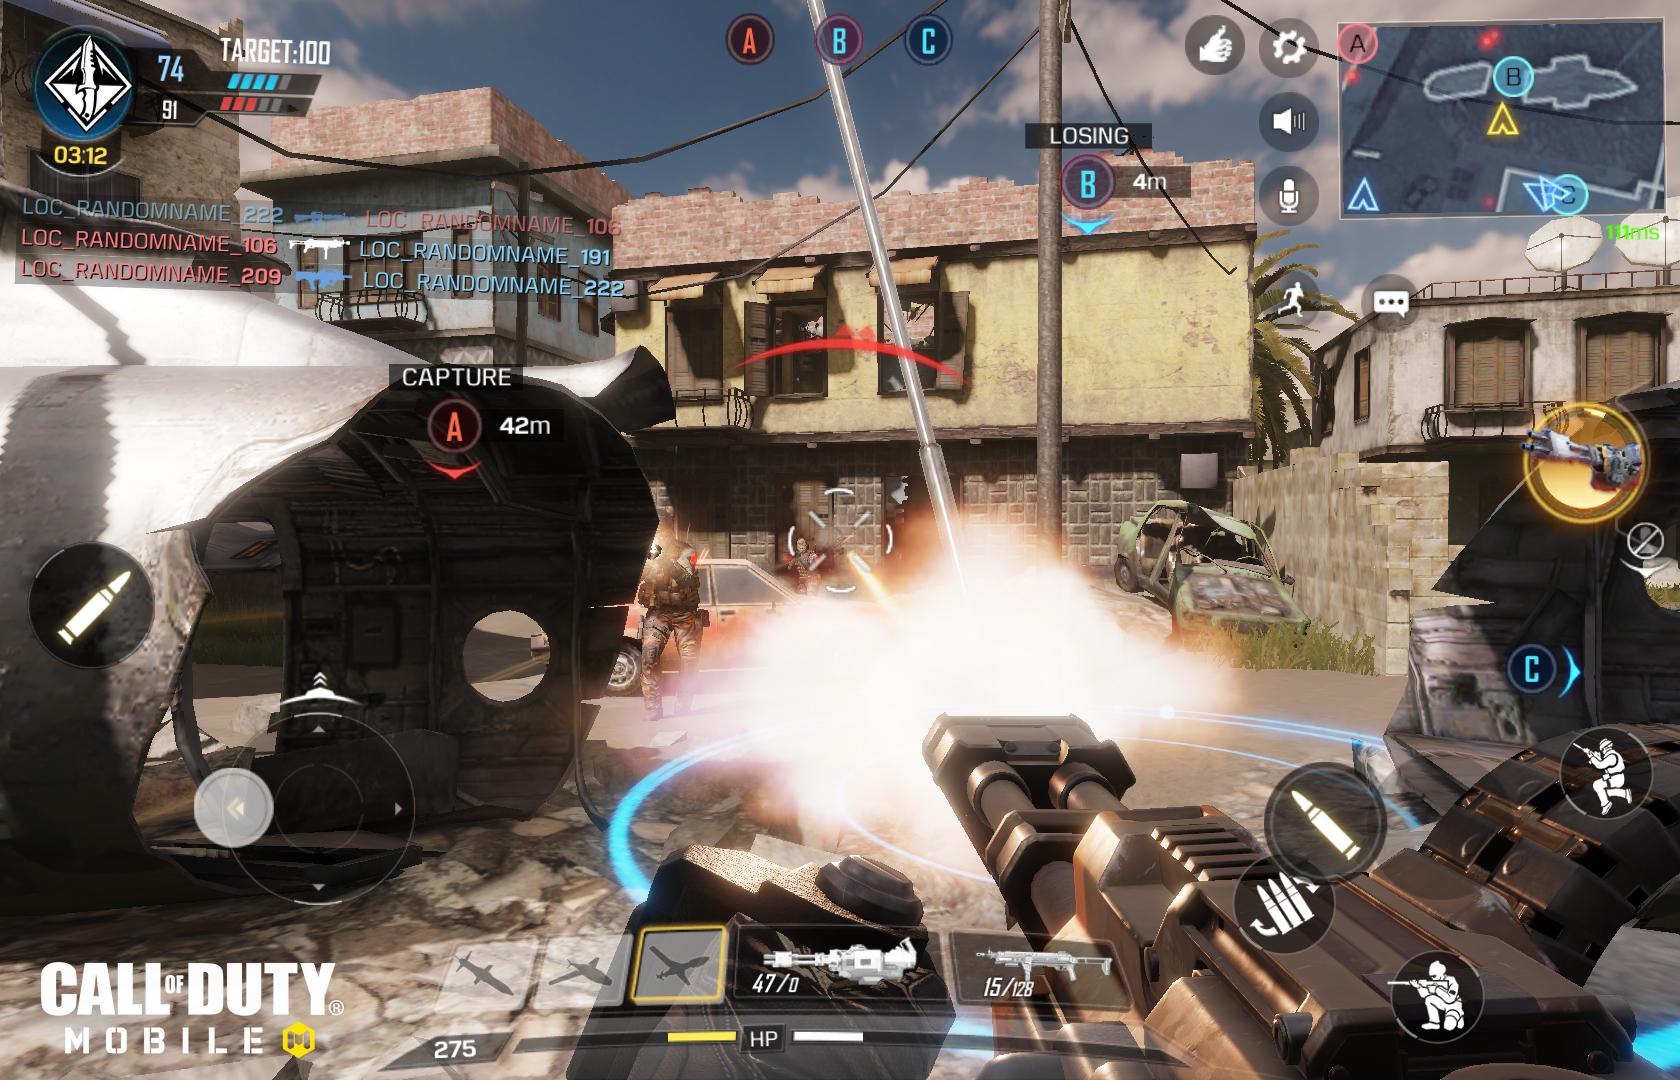 Activision Blizzard creates new mobile studio for Call of Duty | VentureBeat